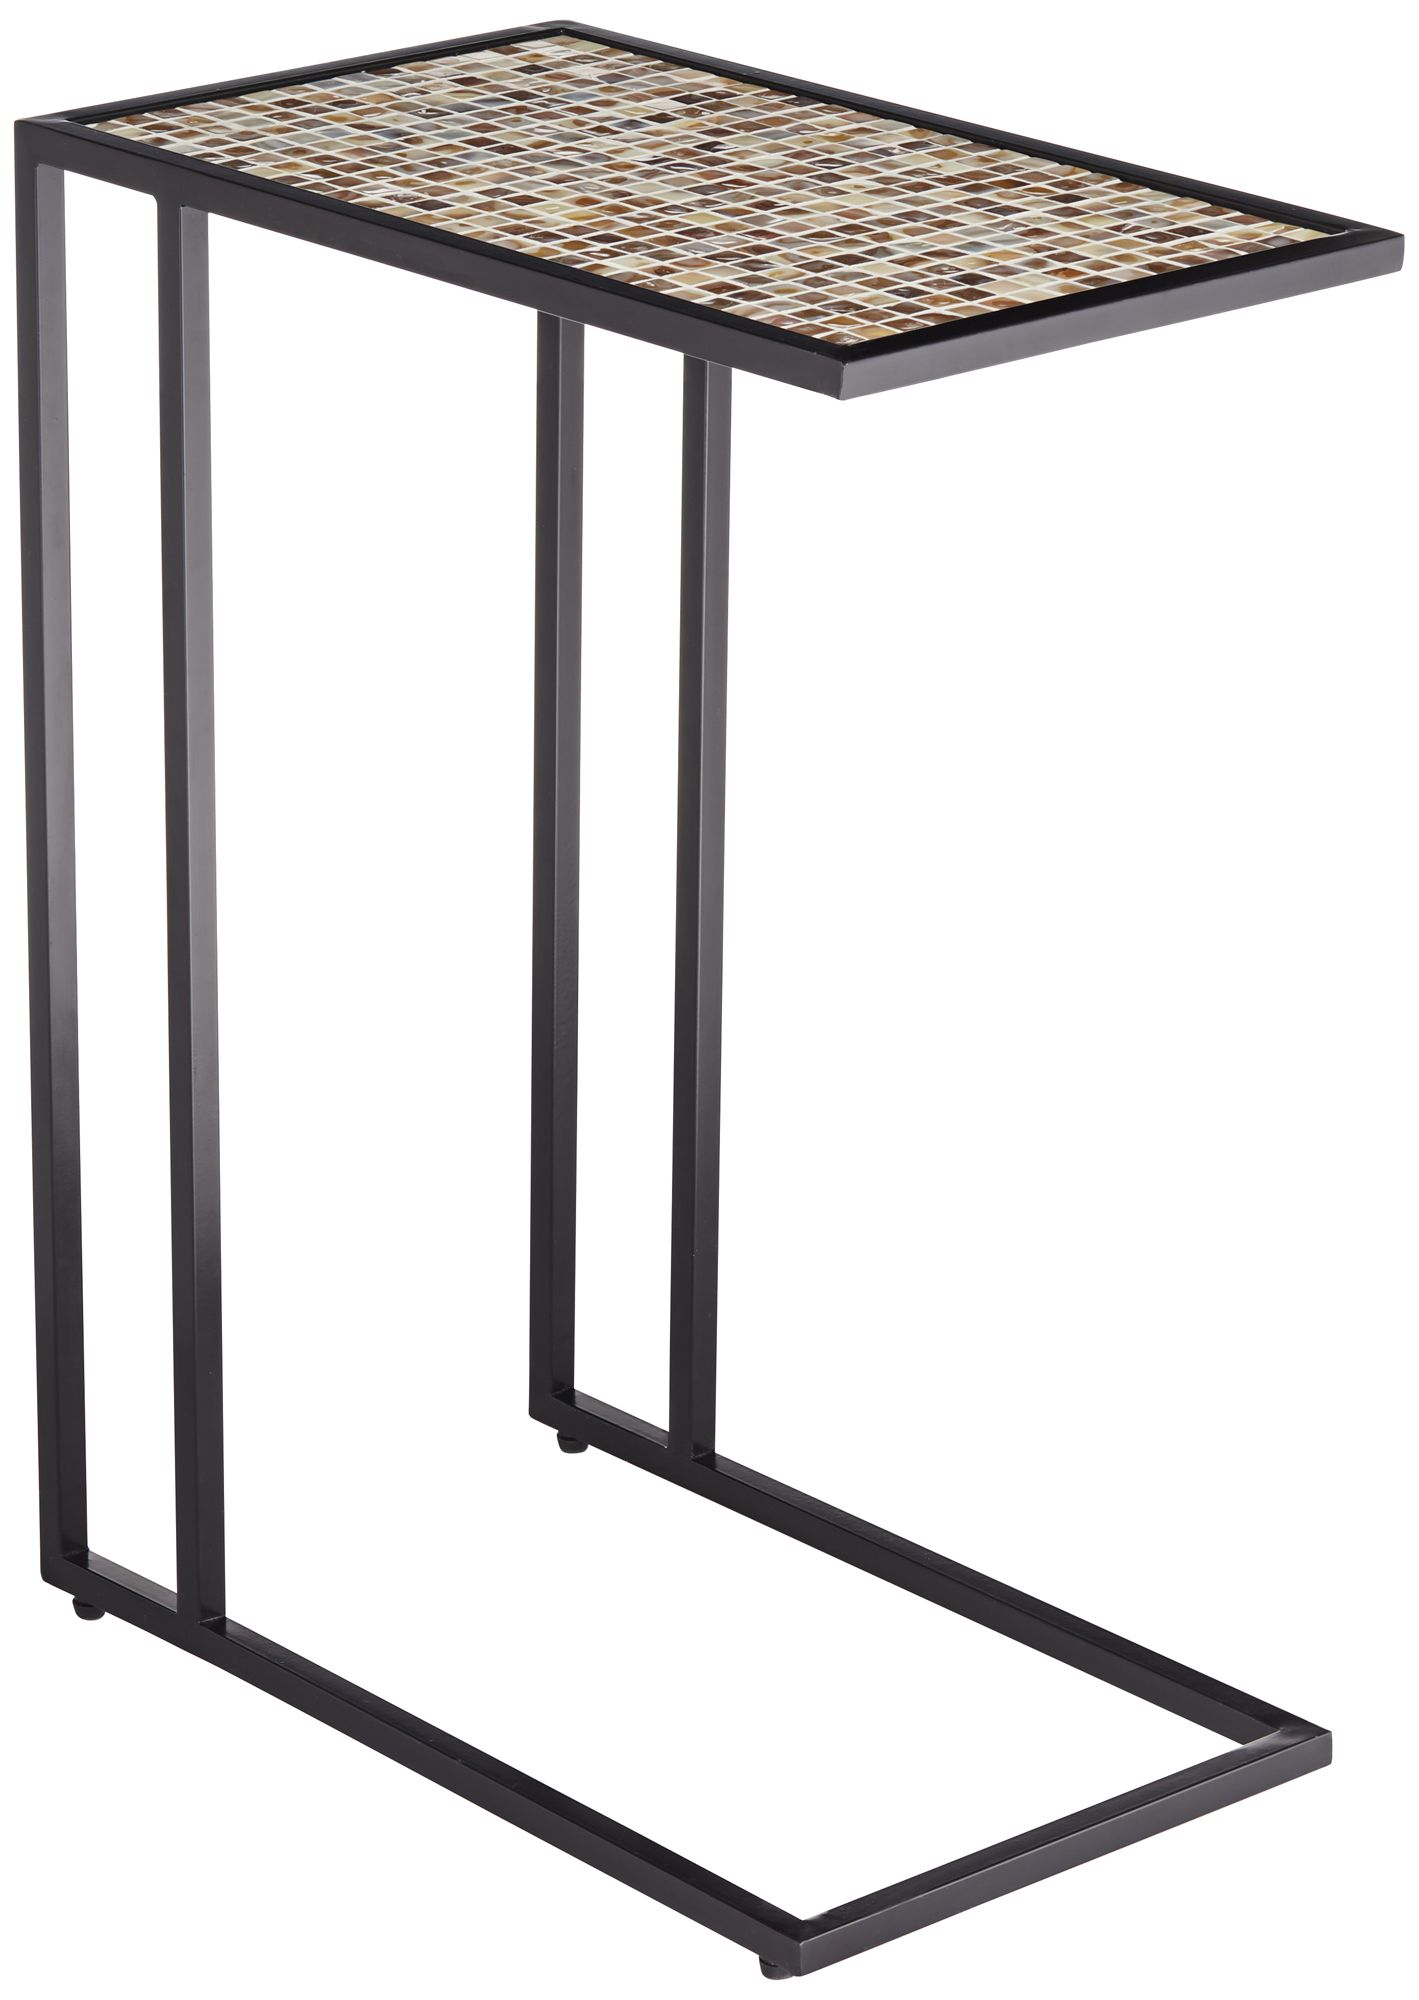 ikonois mosaic tile top c frame side table